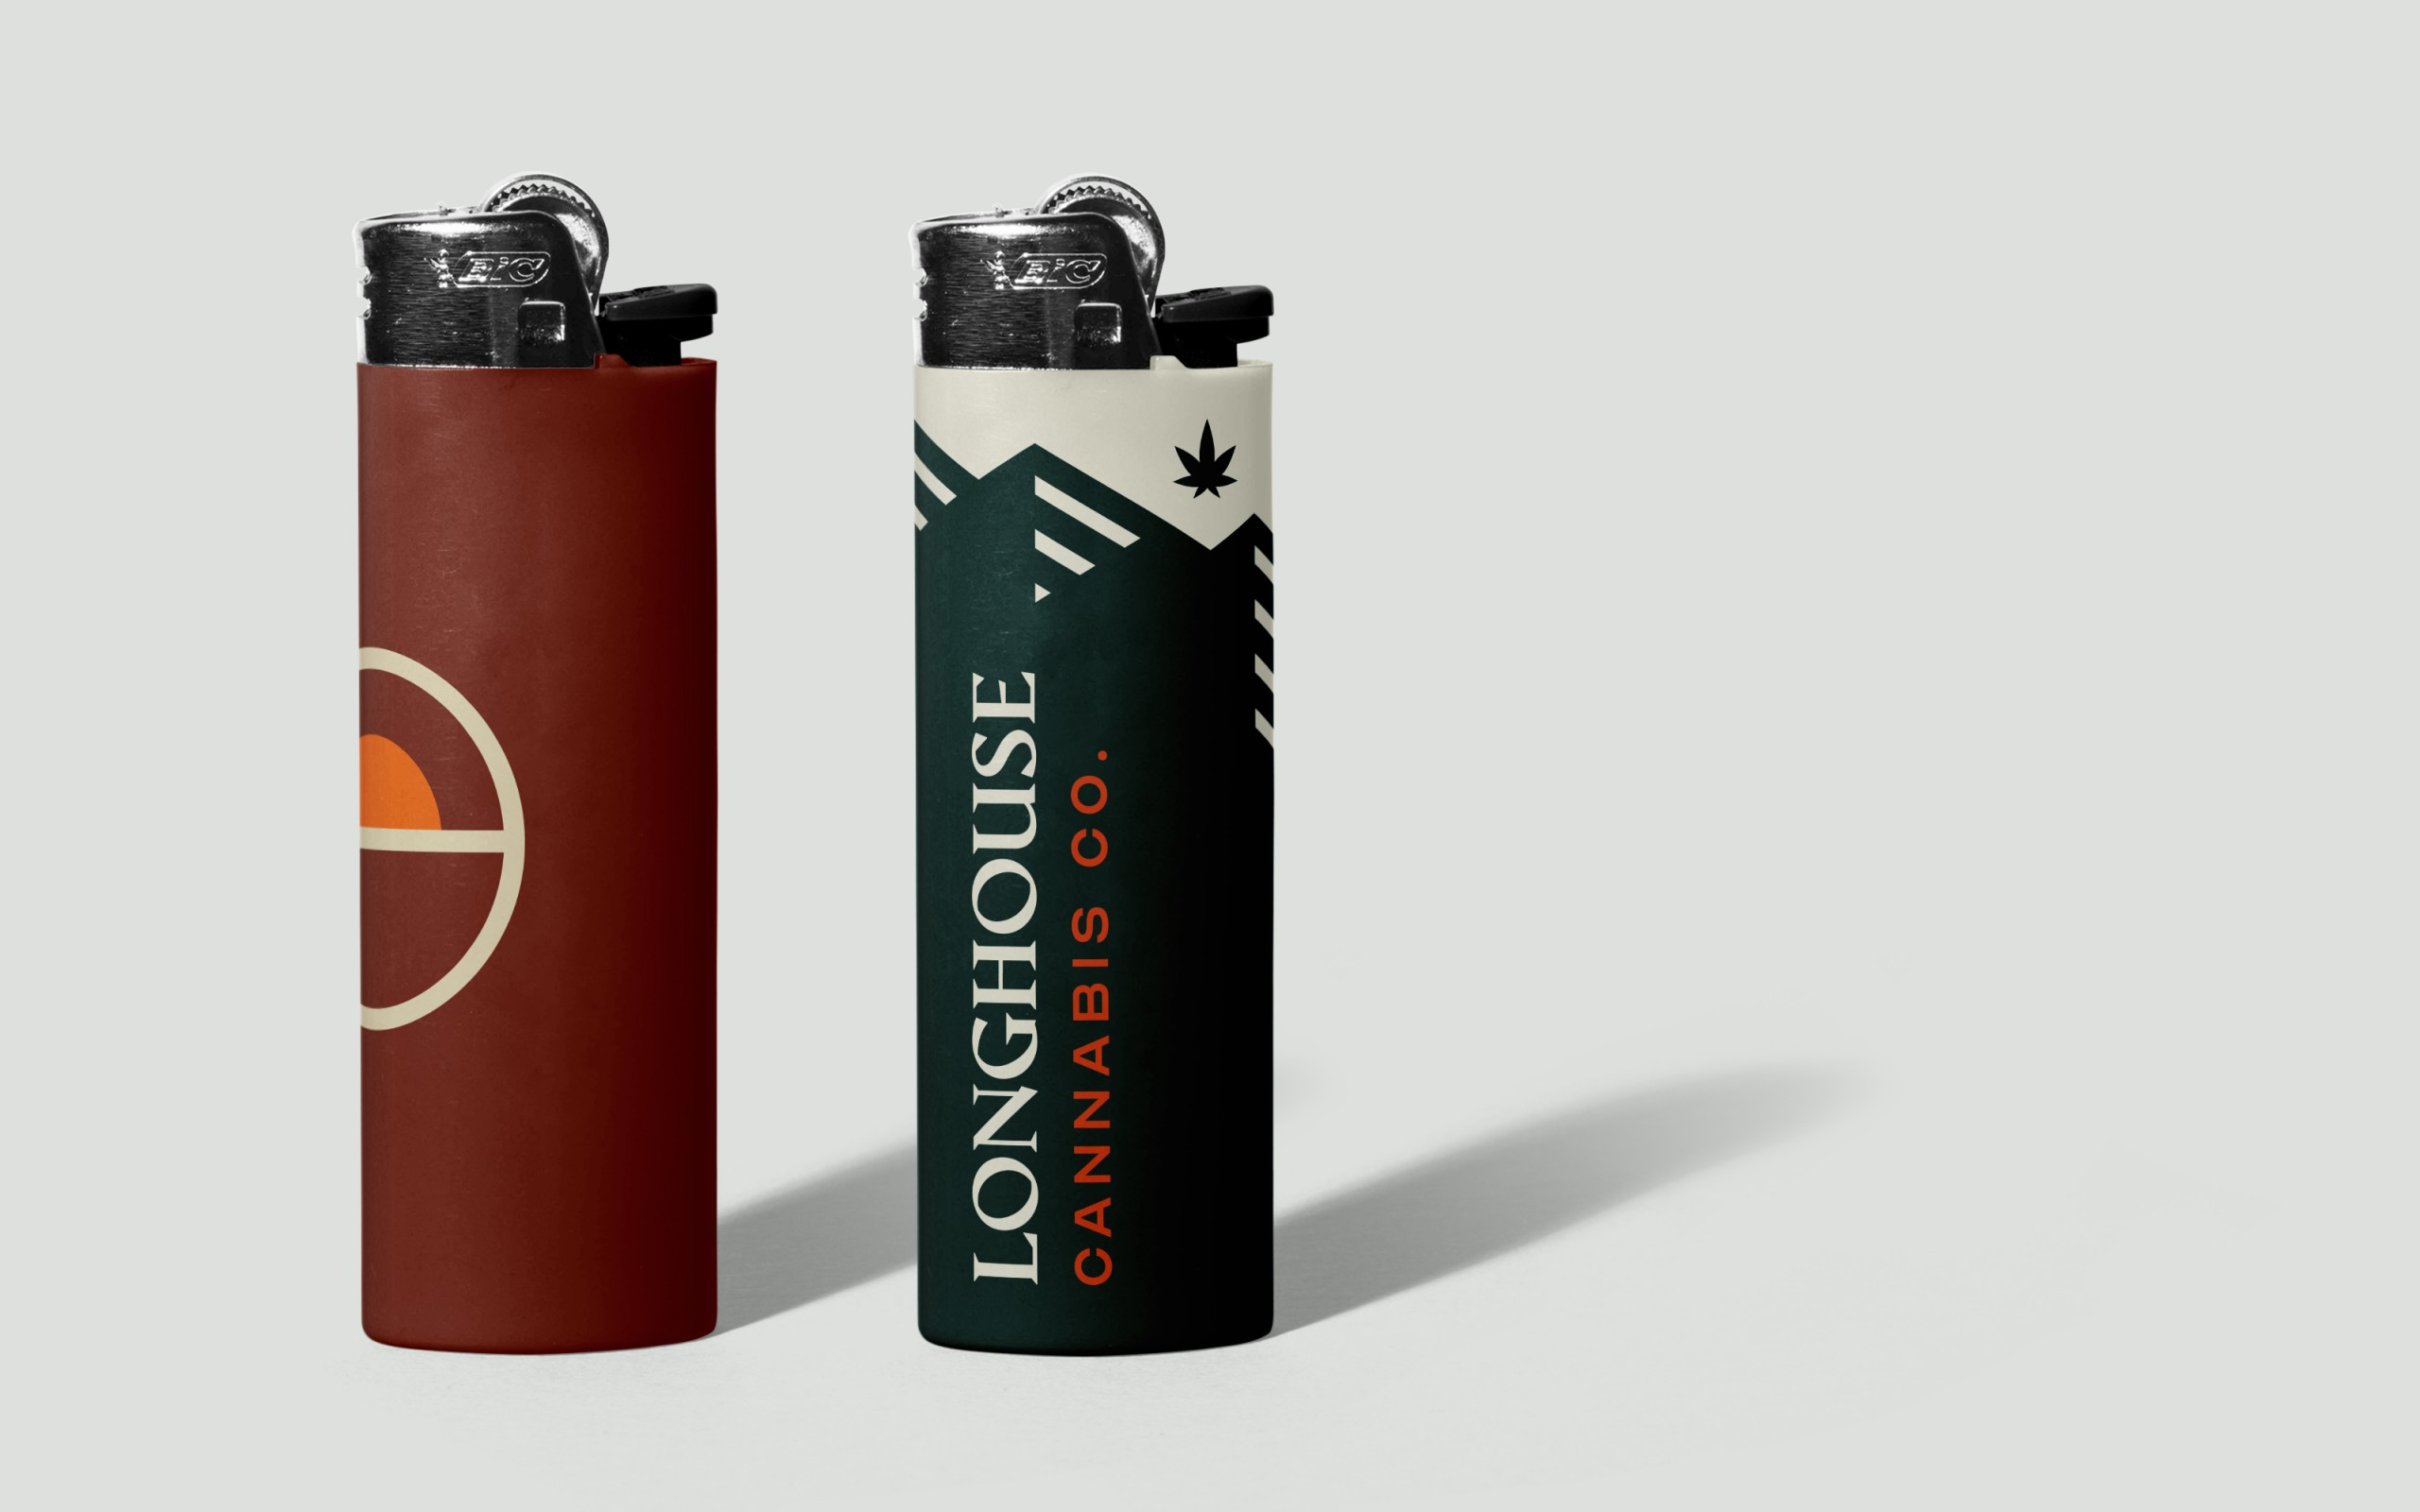 Mockups of the brand on plastic lighters.